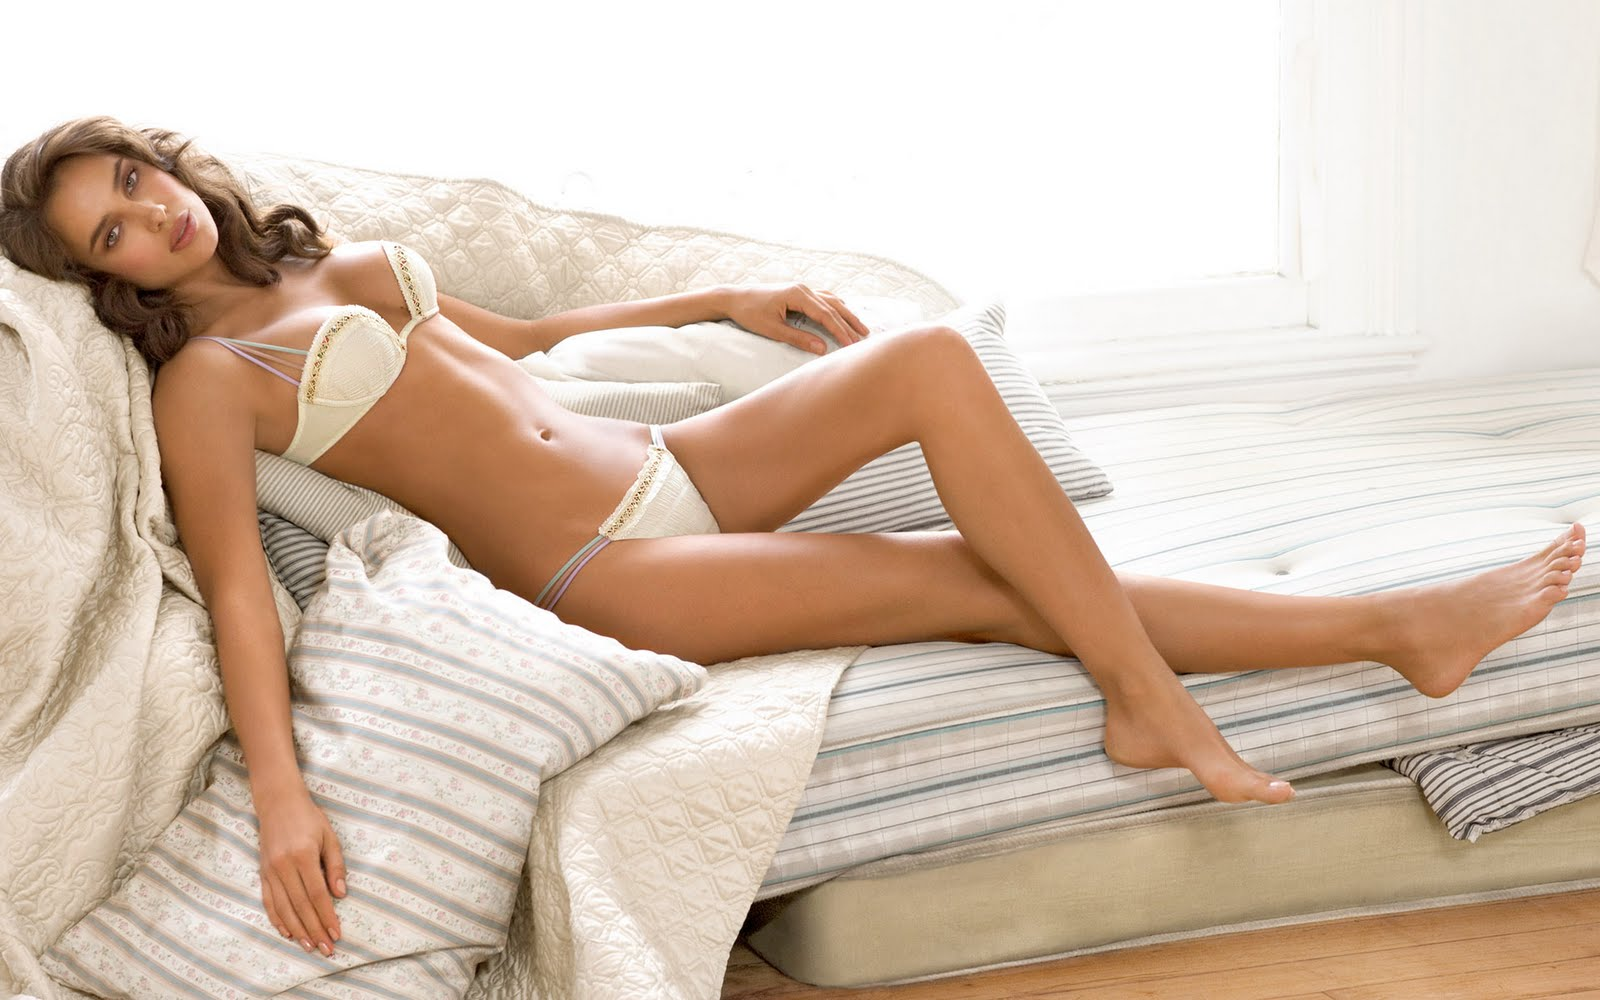 chelsea charms morning mastubating porn